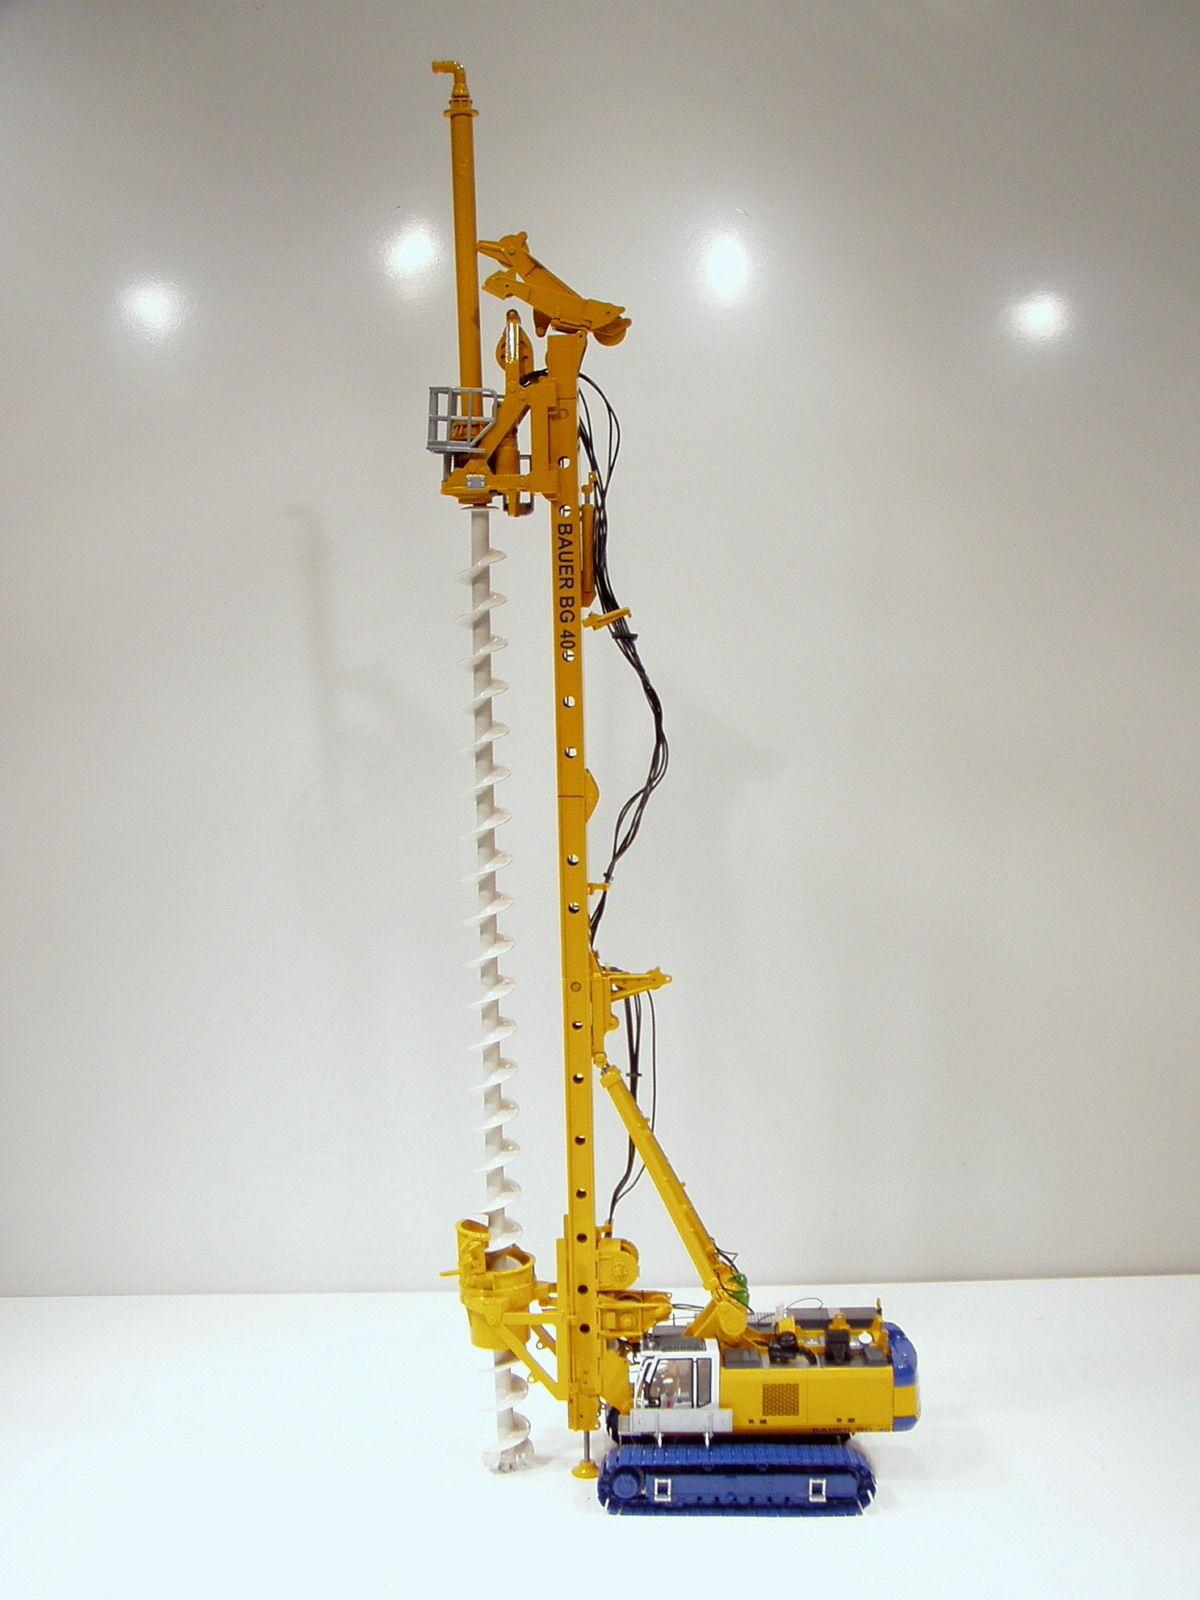 Bauer BG40 Drilling Rig - 1 50 - Brami  25009 - Brand New